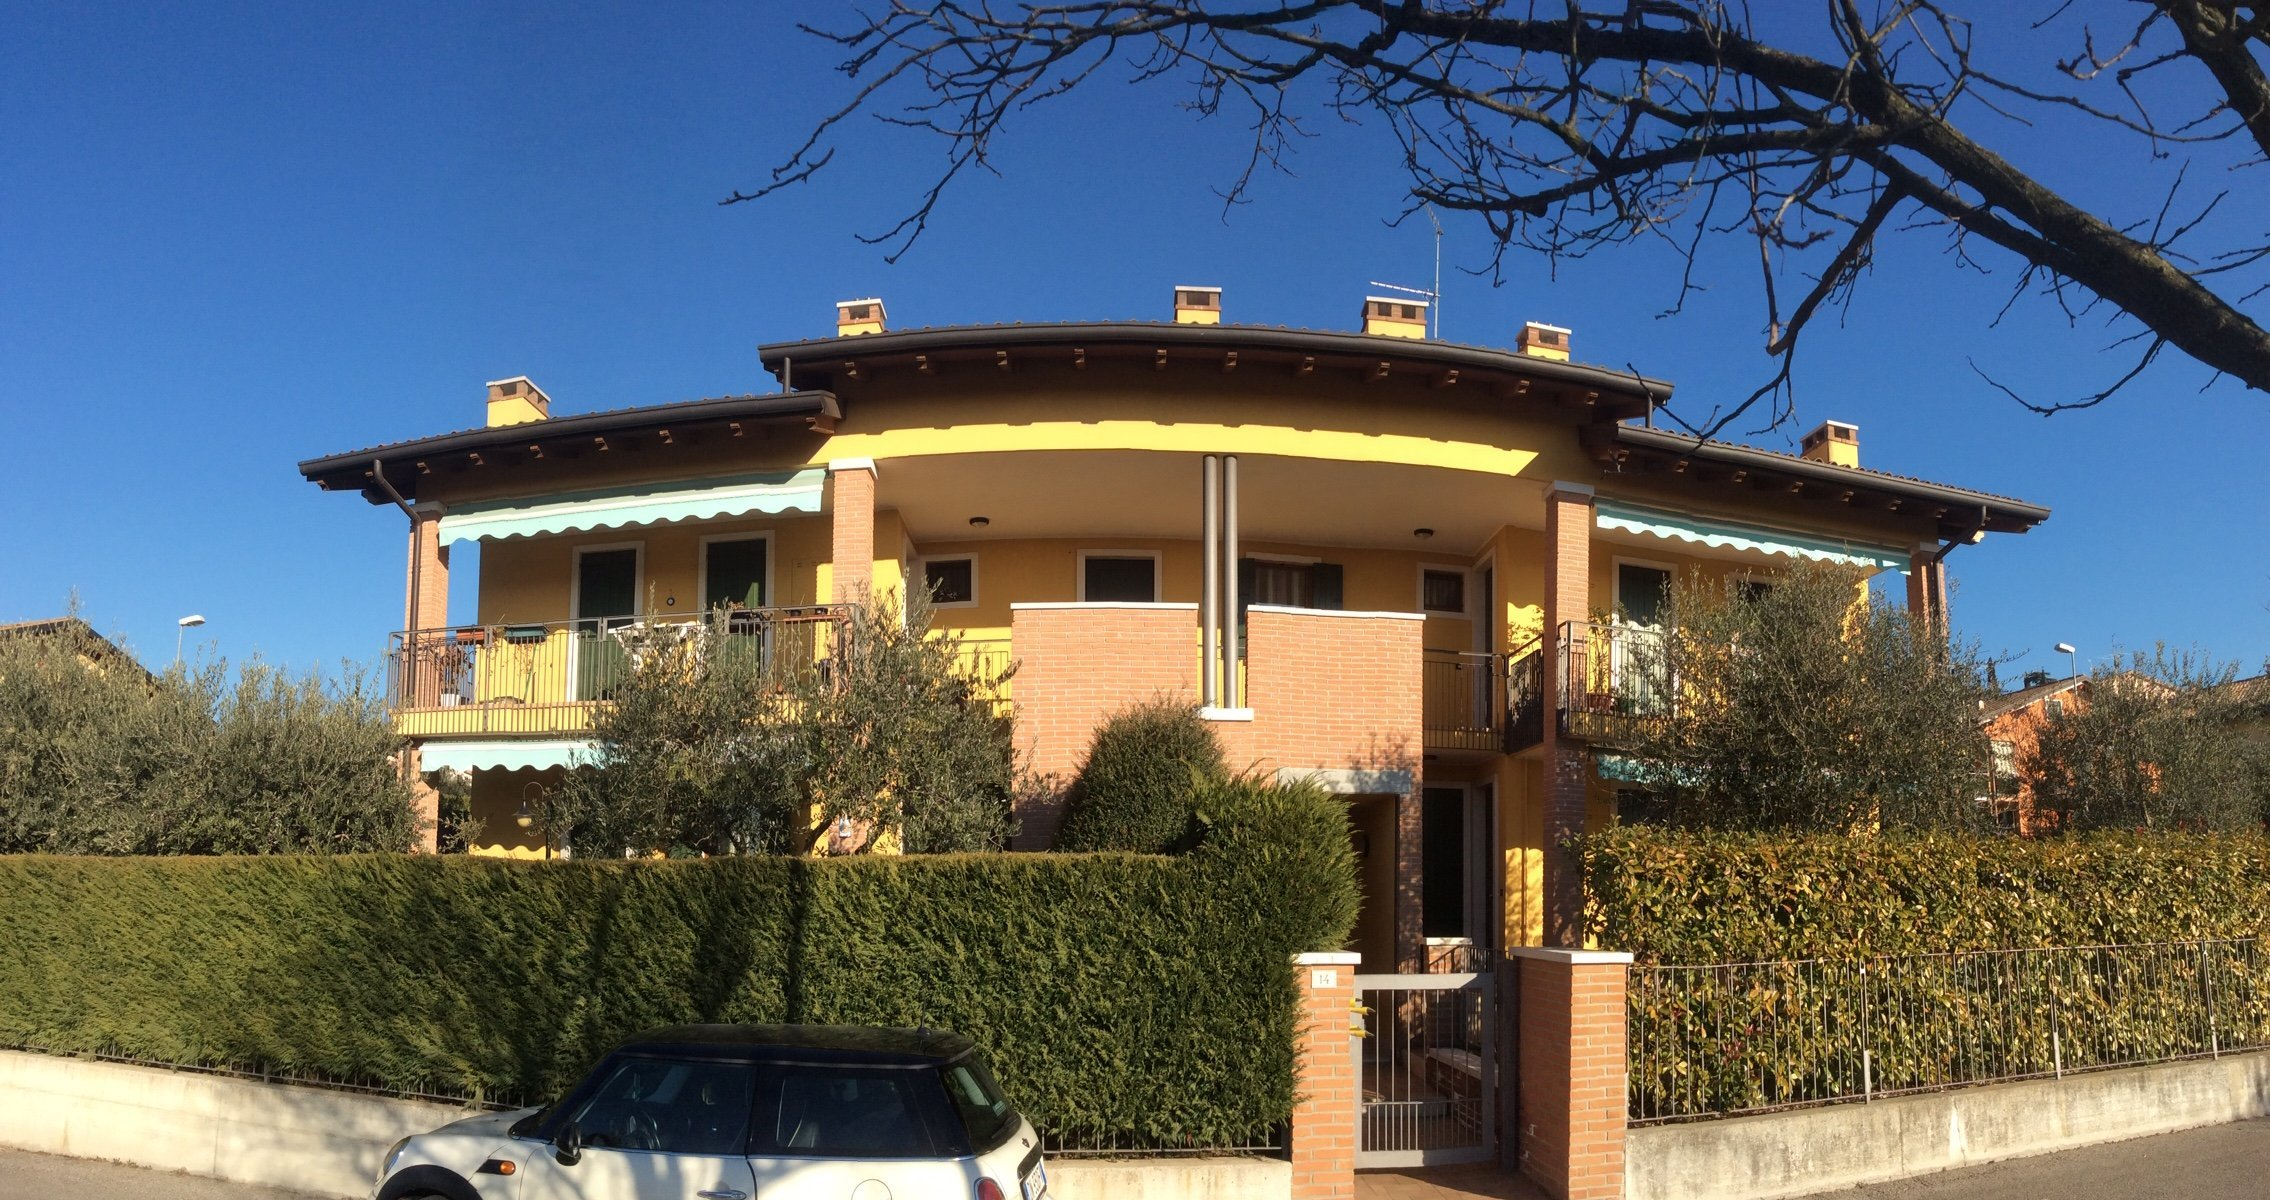 Villetta con giardino a toni gialli